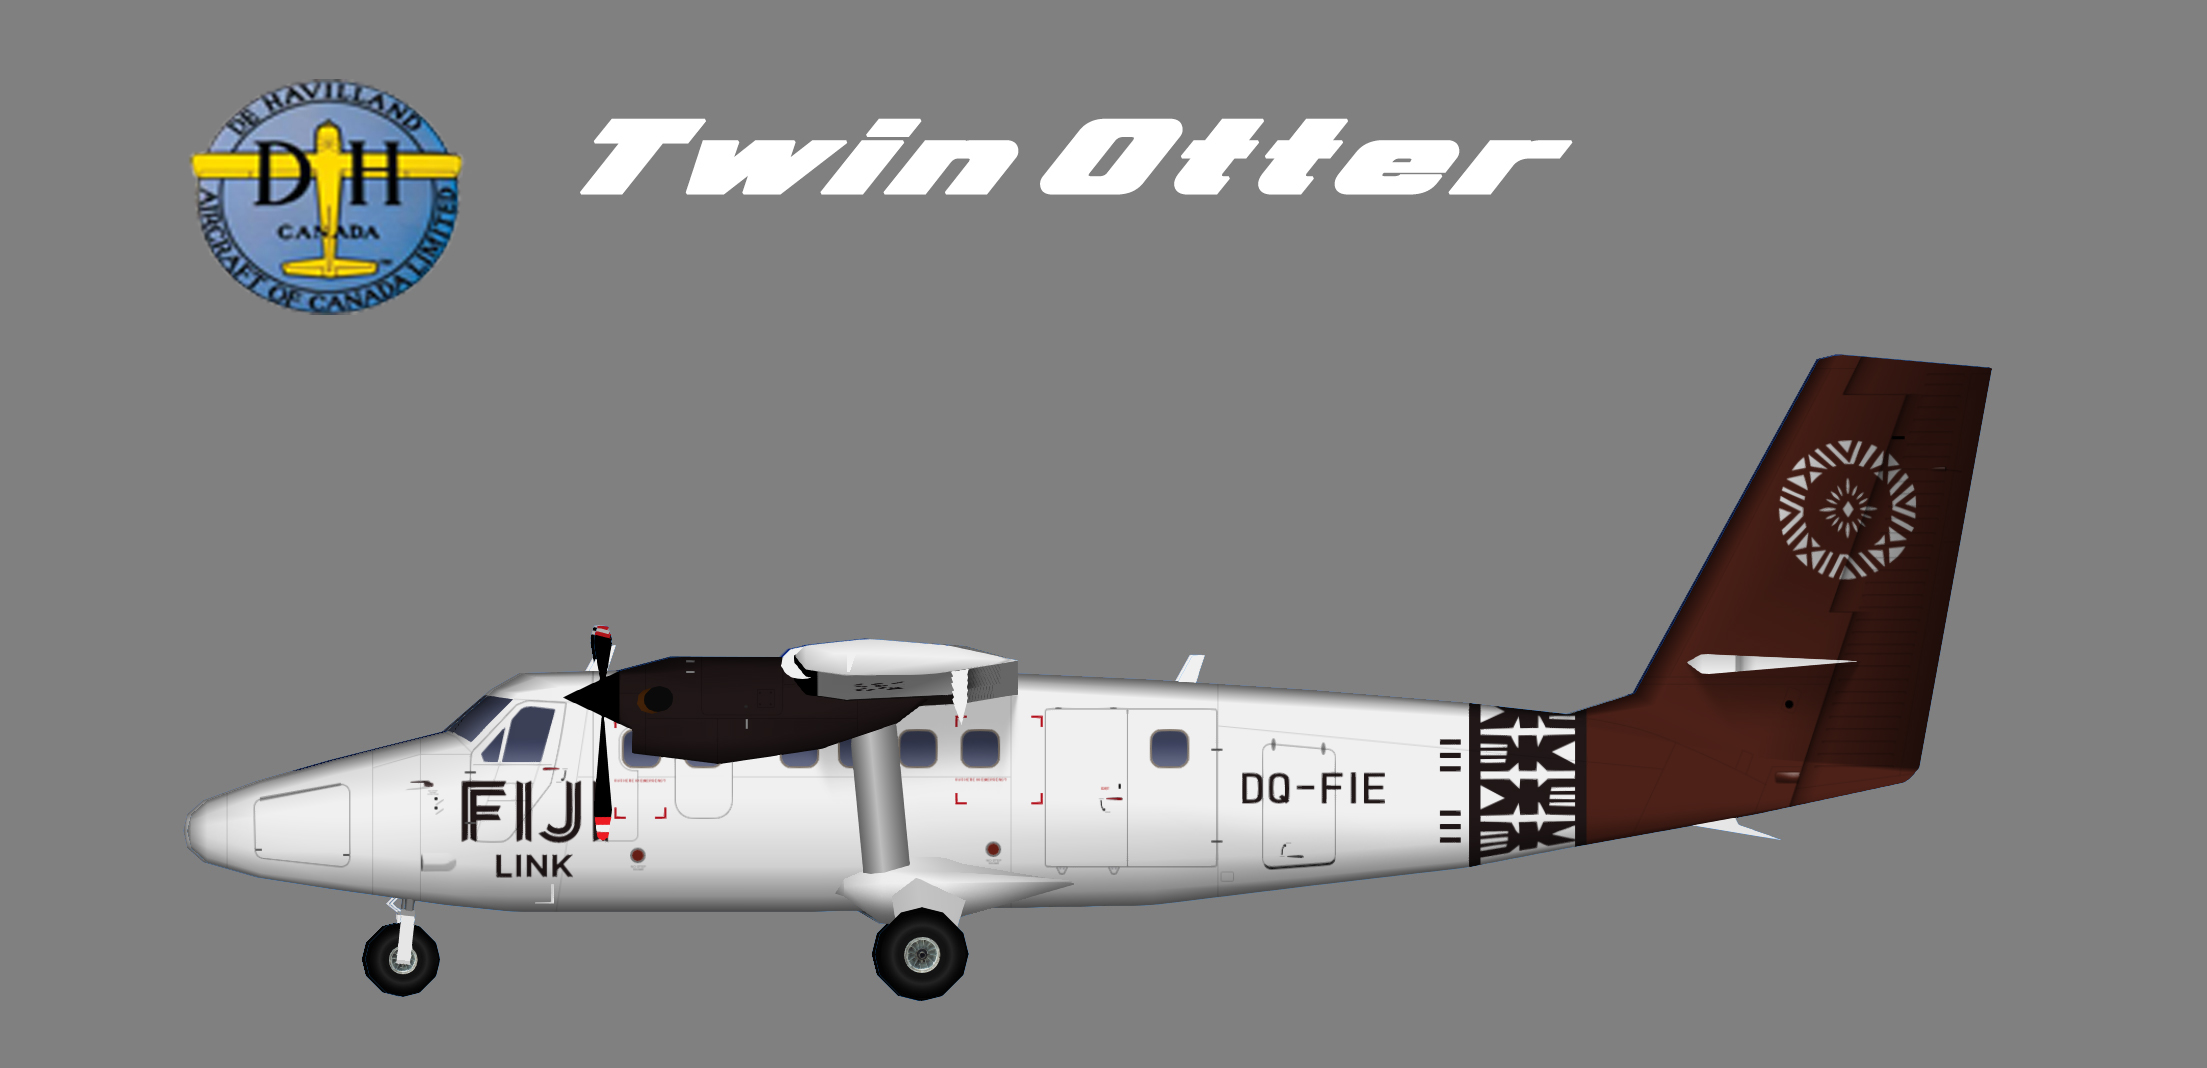 Fiji Link DHC6-300